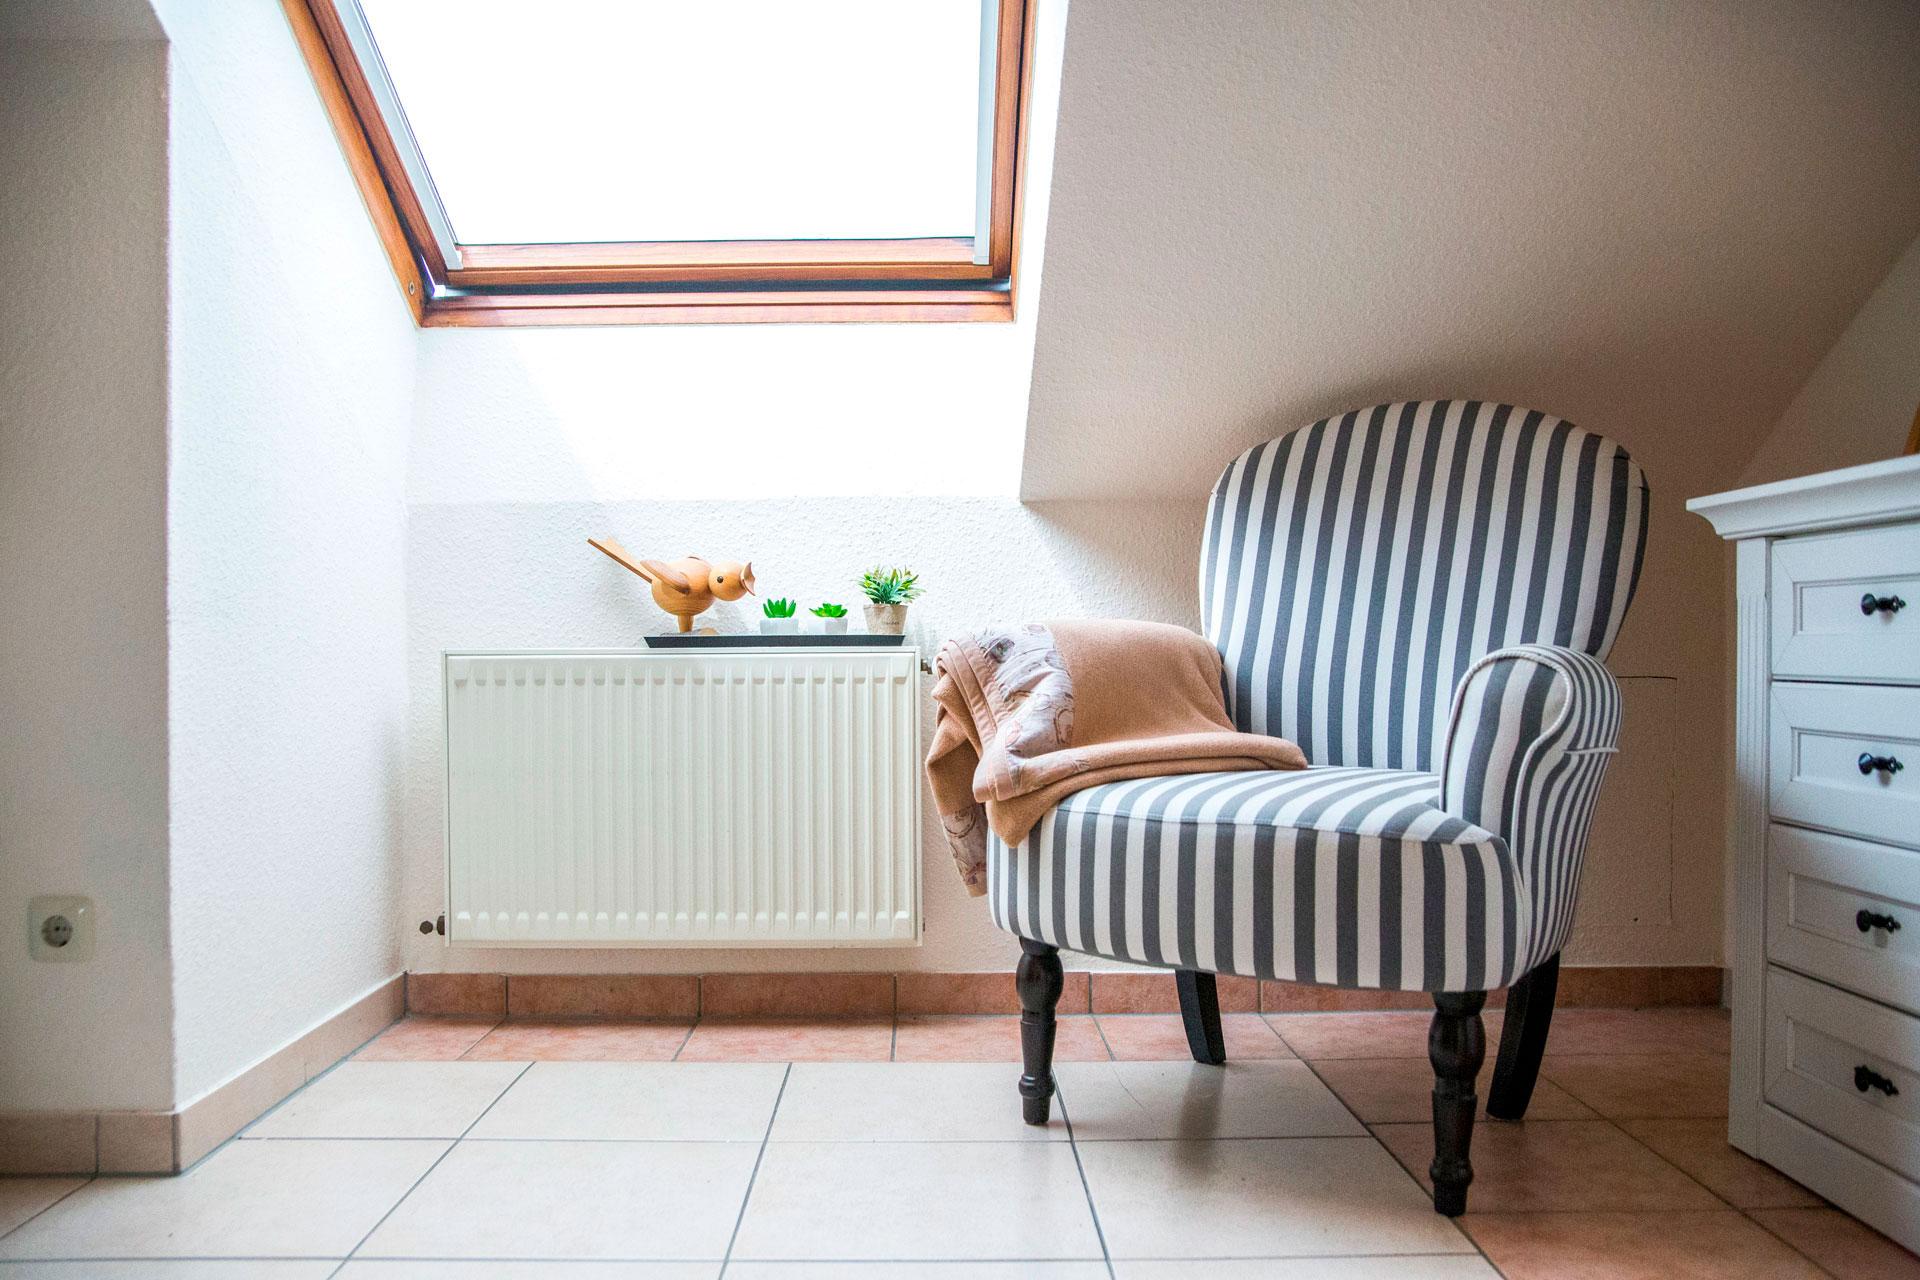 pflegeheim-nortorf-image-dr-blitz-gmbh-langzeitpflege-kurzzeitpflege-19